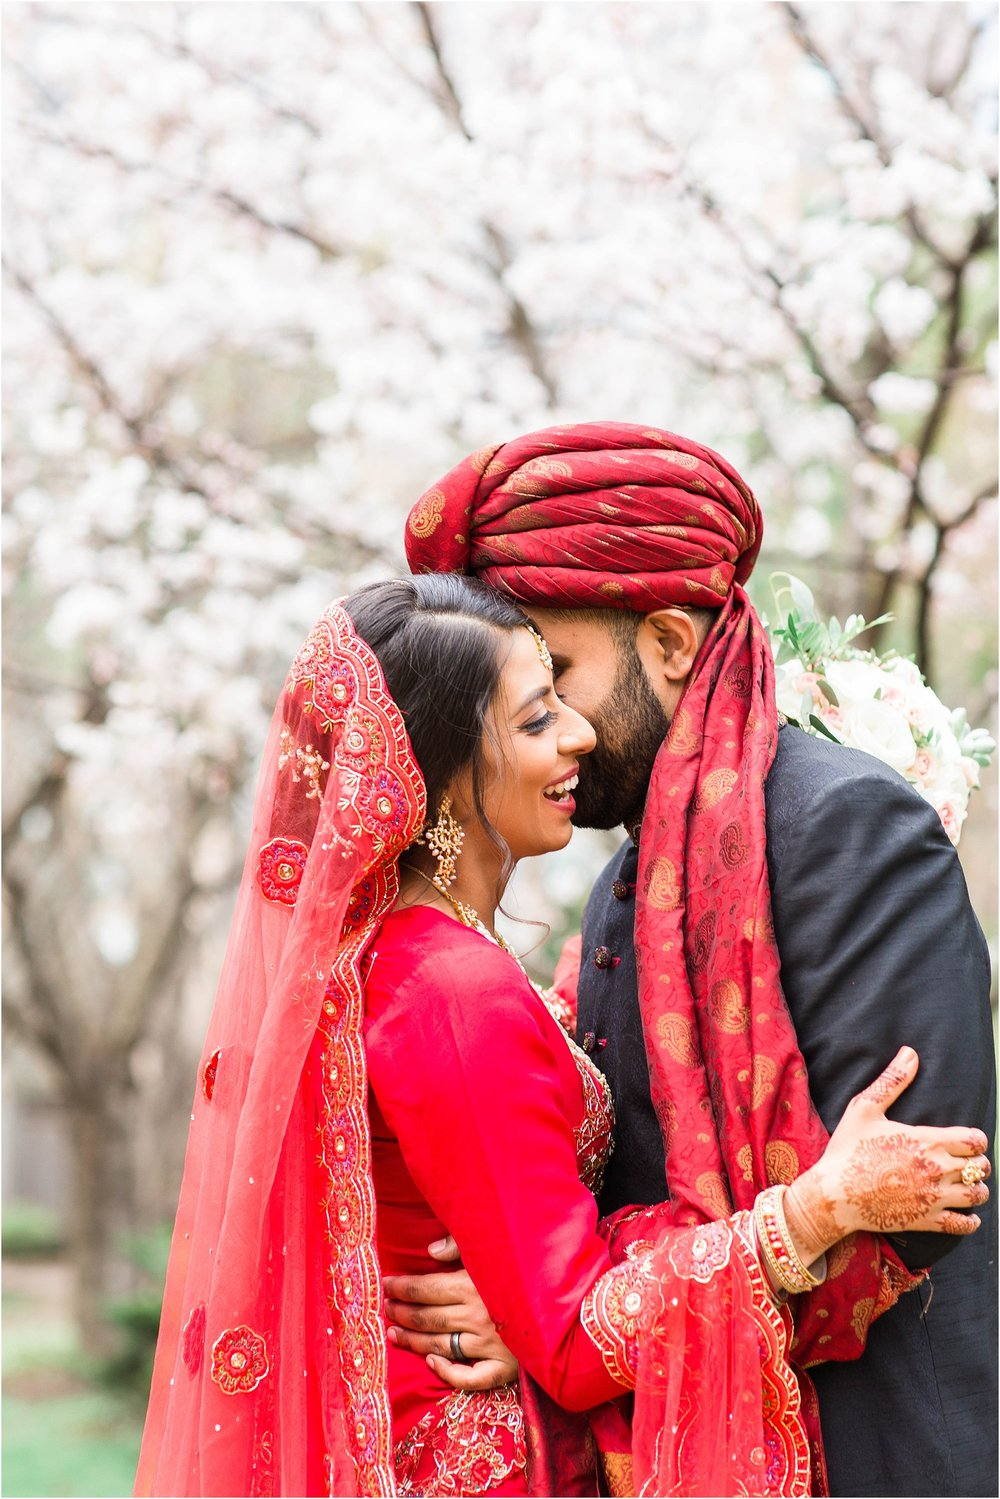 Jame-Masjid-Coopers-Mosque-Kariya-Park-Cherry-Blossoms-Wedding-Toronto-Mississauga-Brampton-Scarborough-GTA-Pakistani-Indian-Wedding-Engagement-Photographer-Photography_0056.jpg